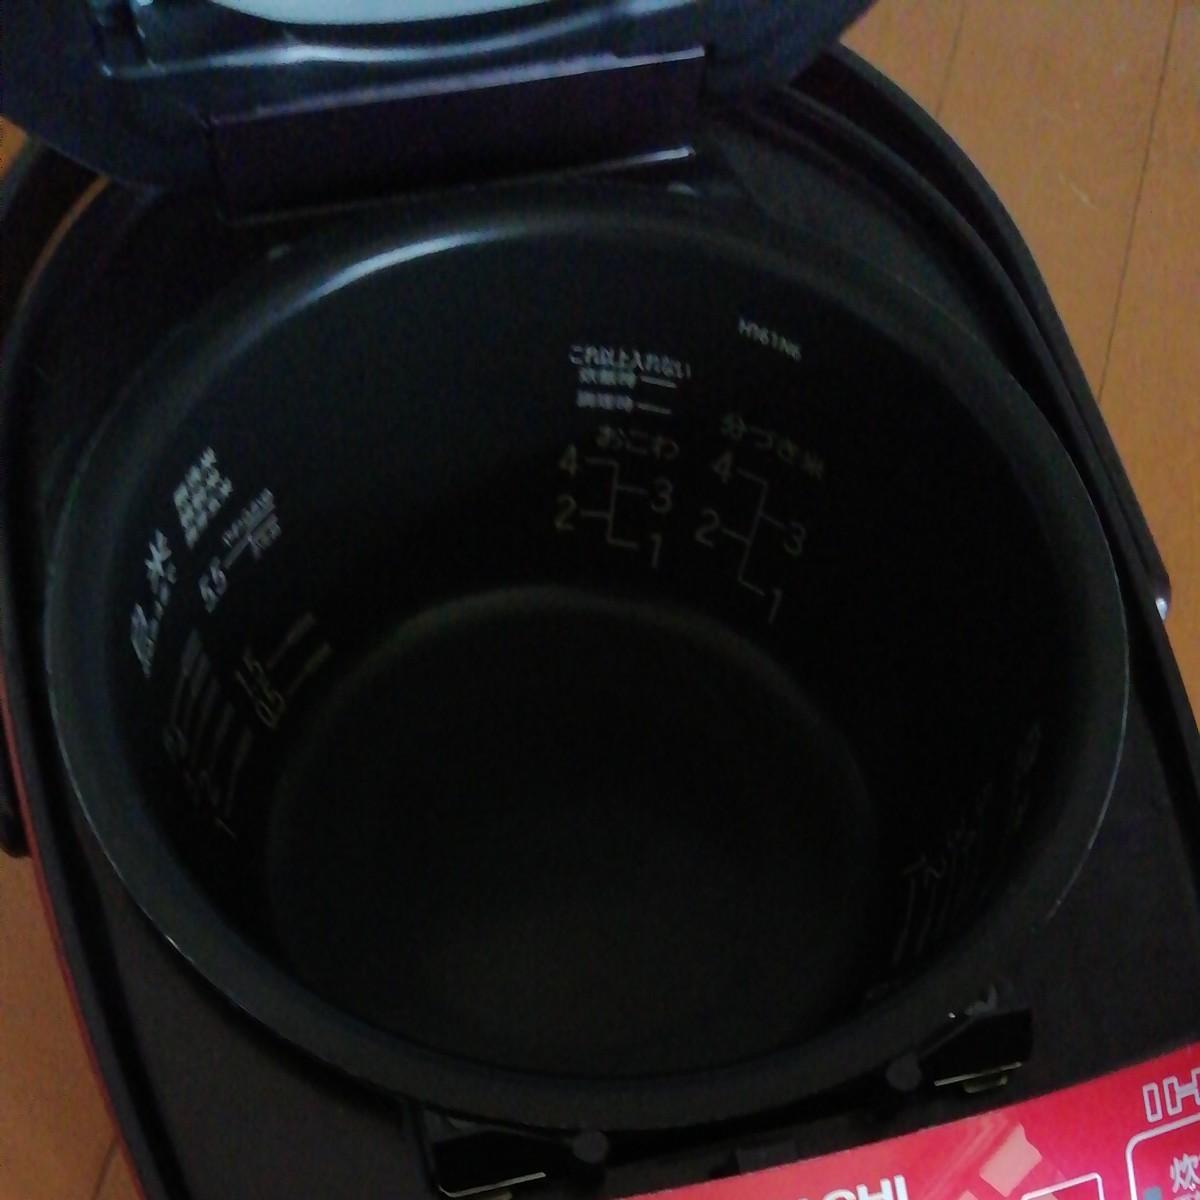 RZ-AV100M 圧力スチーム IH HITACHI IH炊飯ジャー 炊飯器